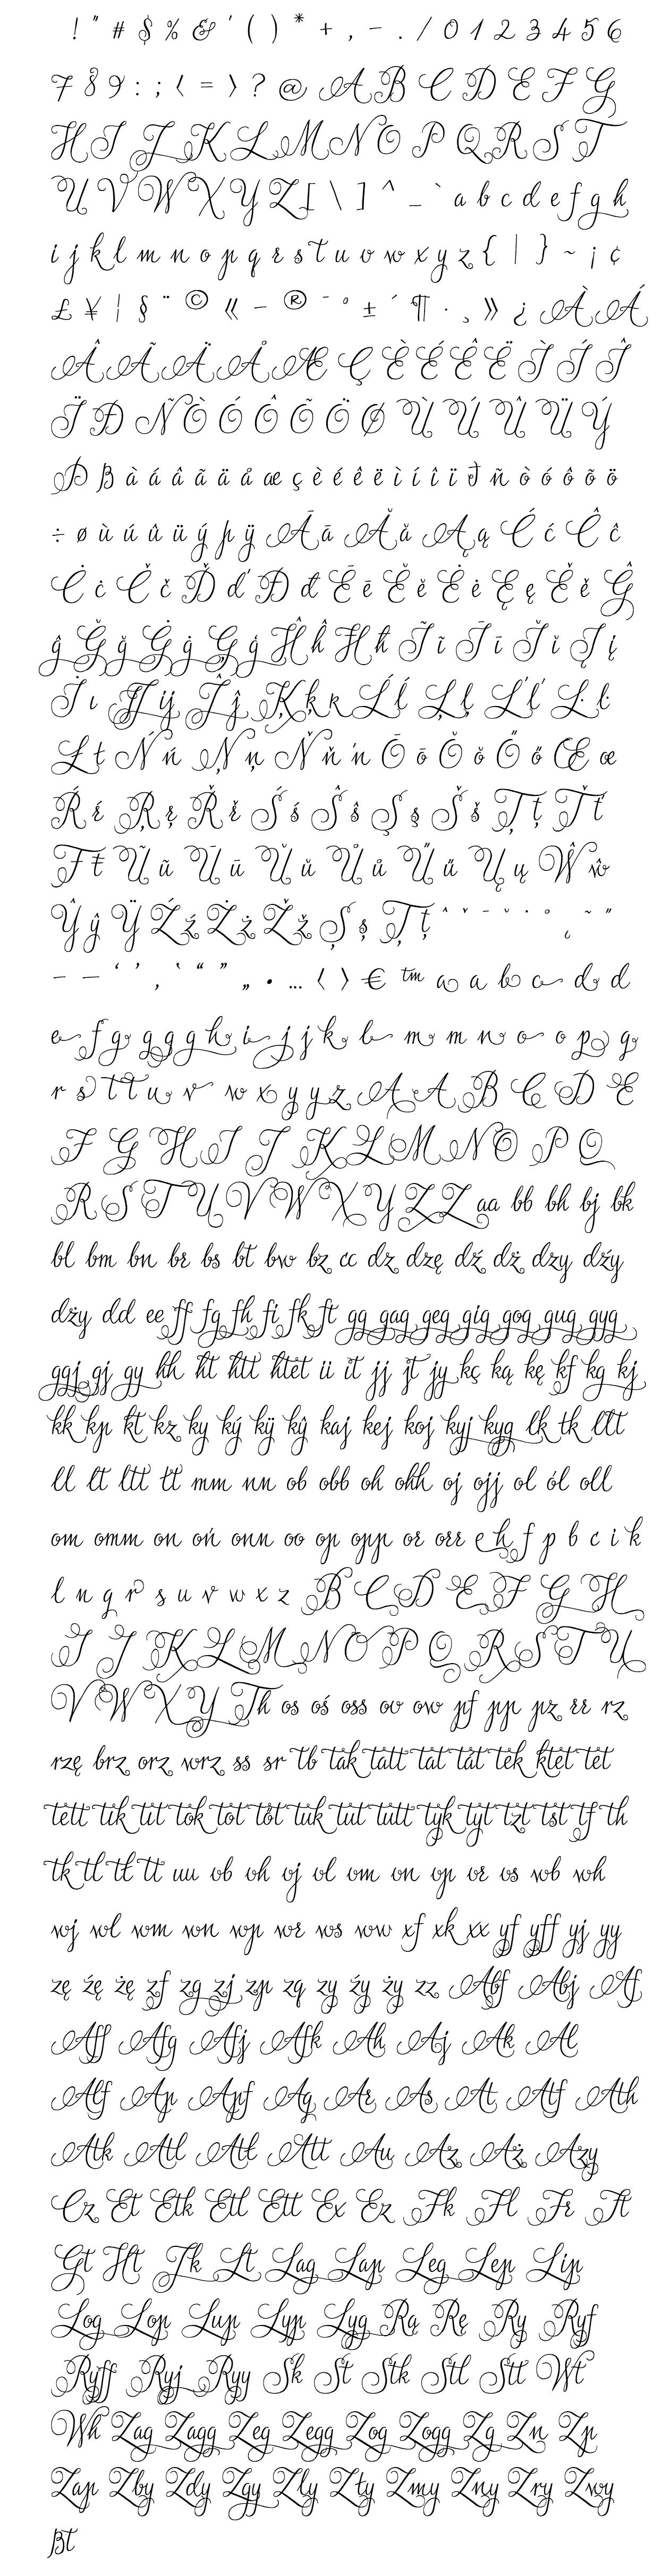 jasminum font  - complete character list